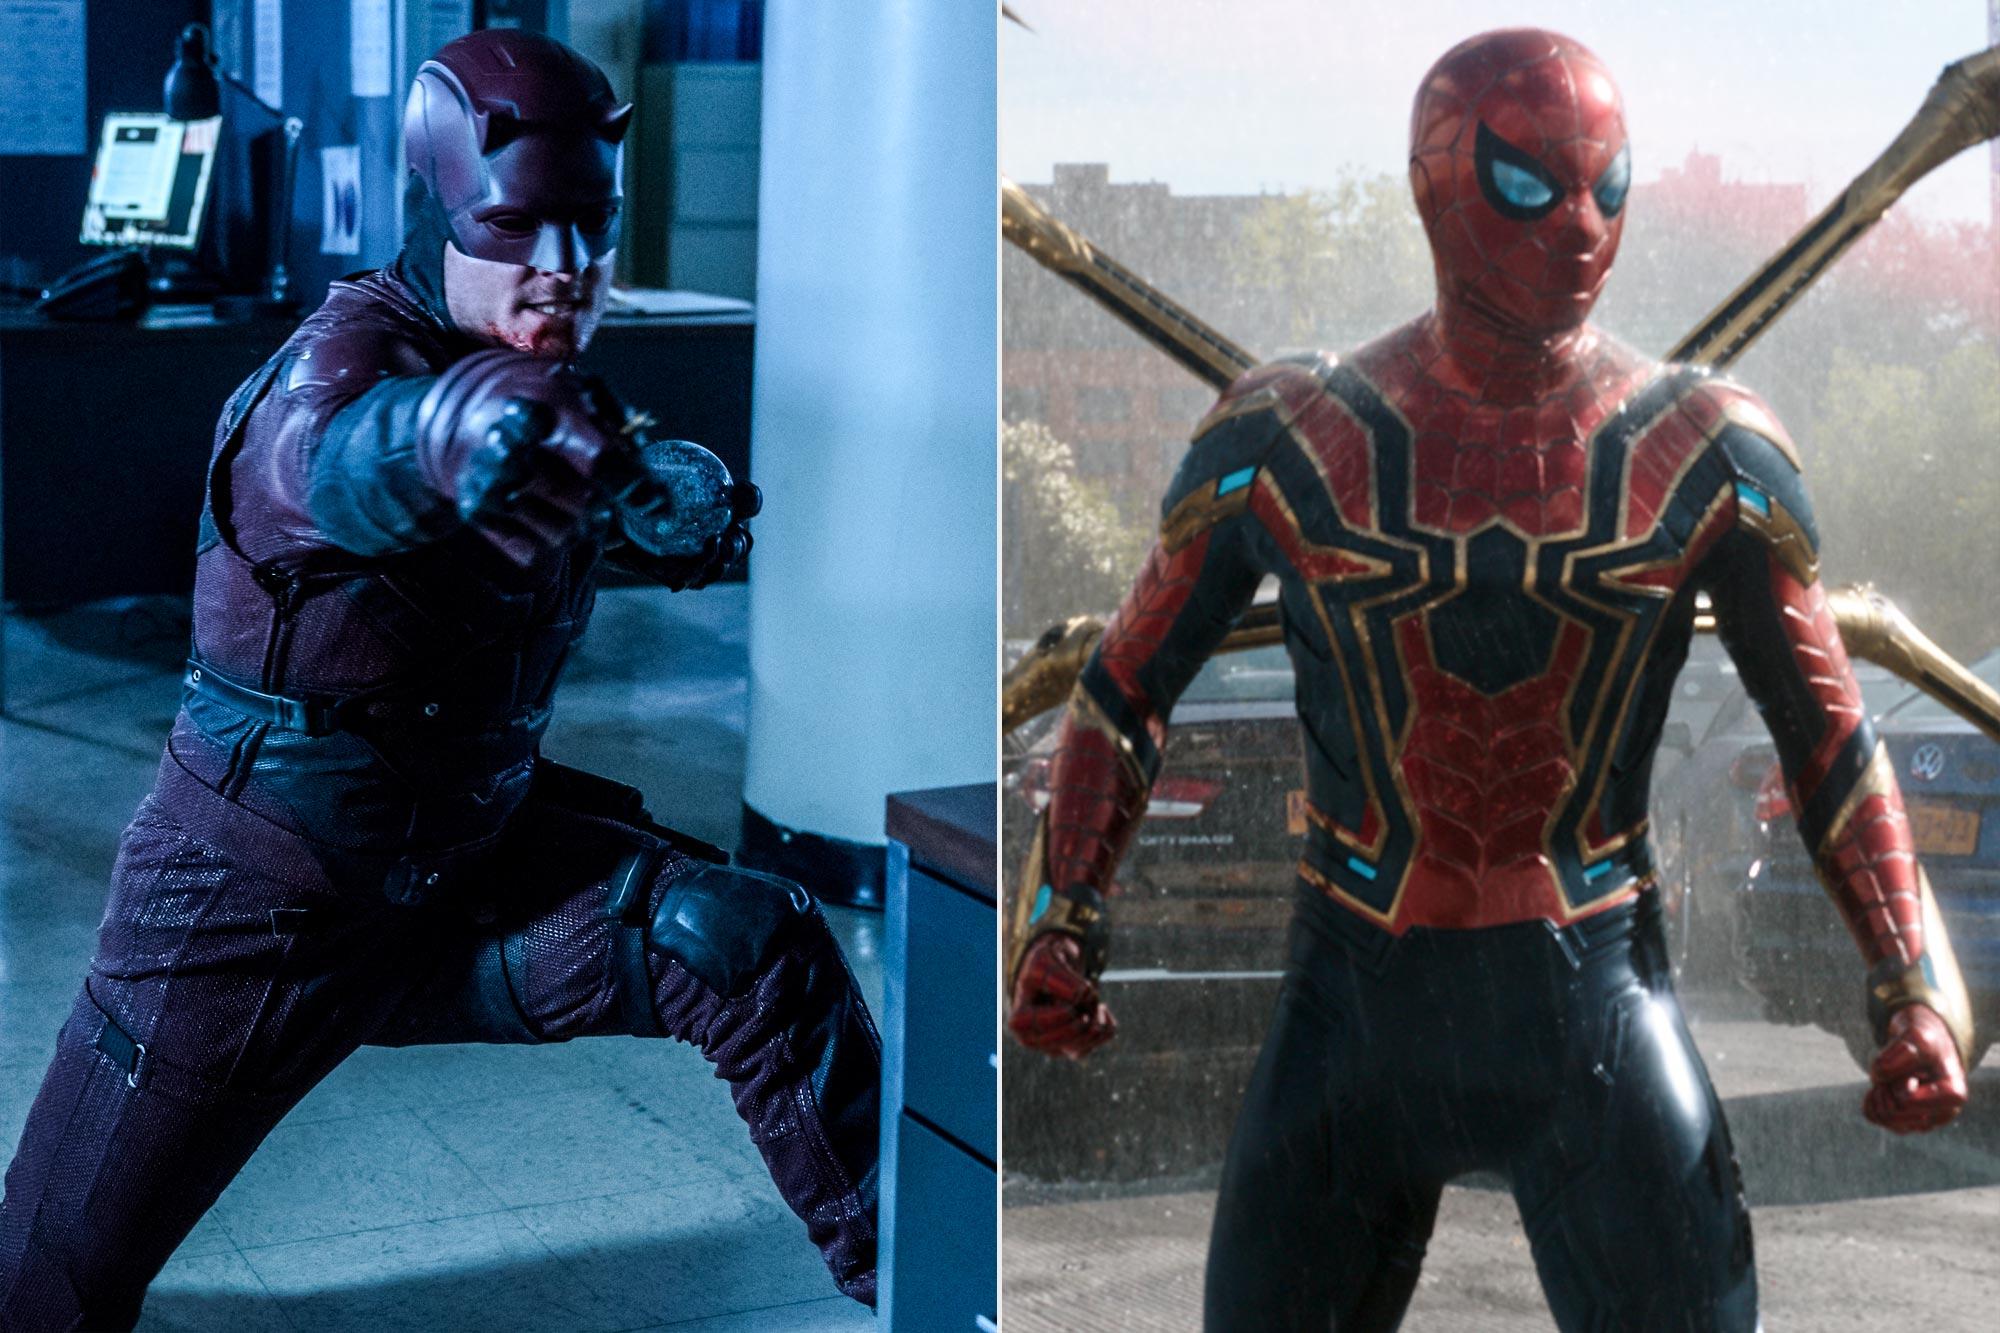 Daredevil; Spider-man No Way Home